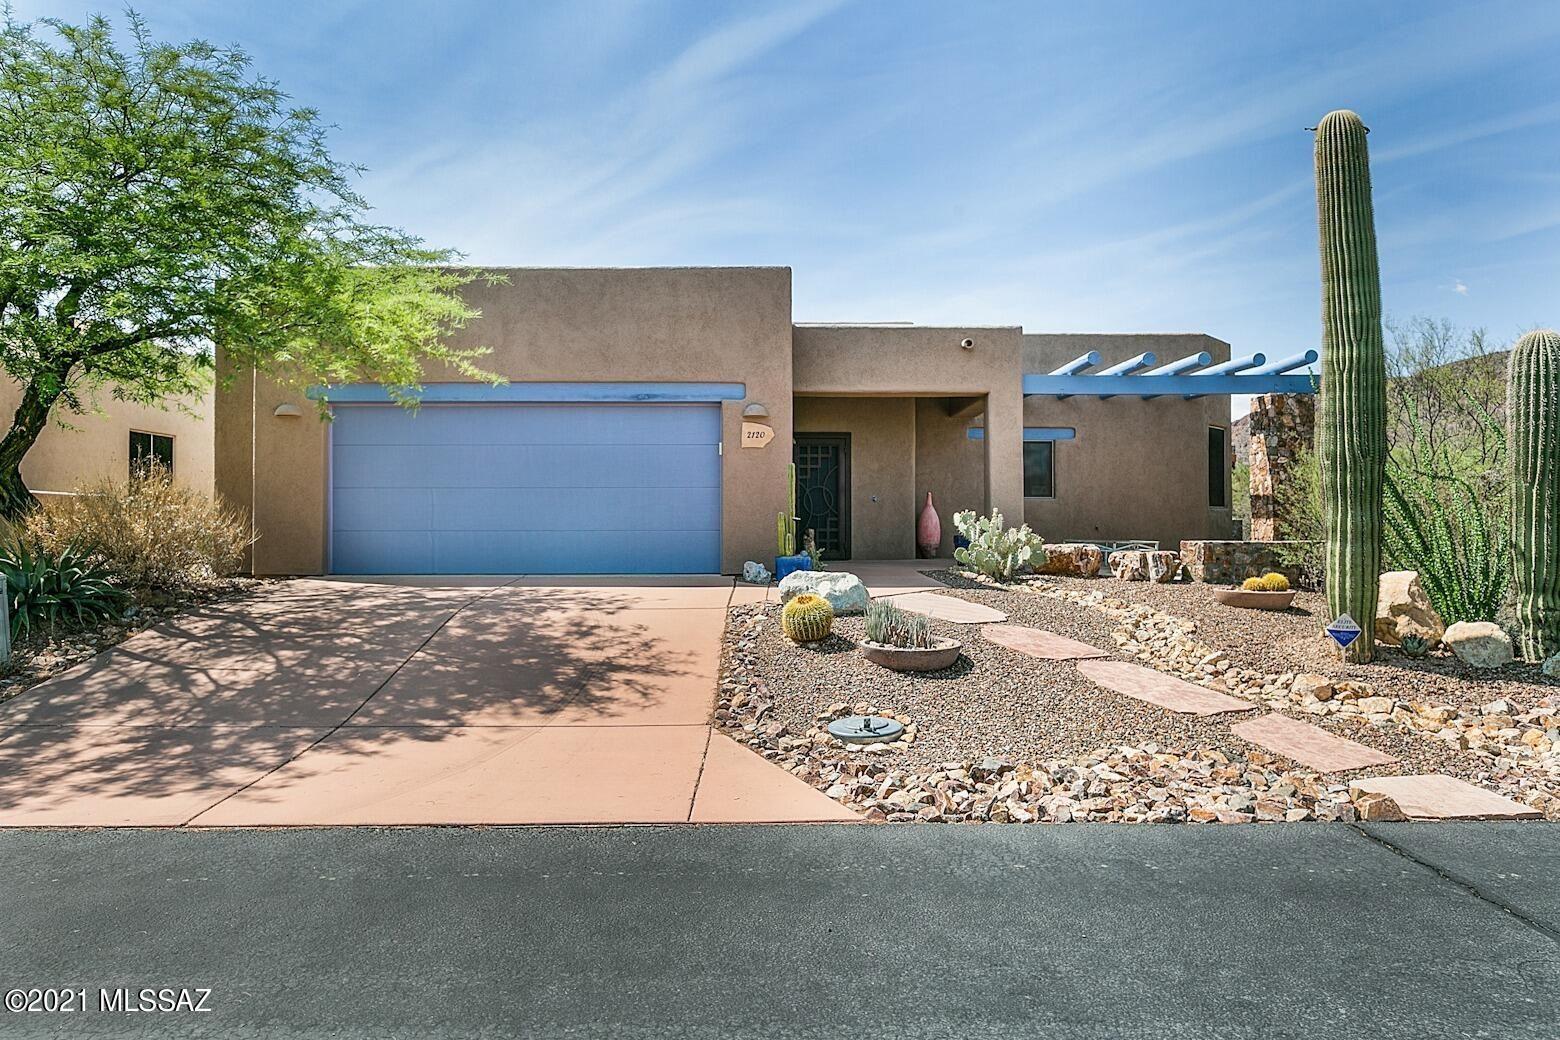 2120 S Double Circle Drive, Tucson, AZ 85713 - MLS#: 22117808